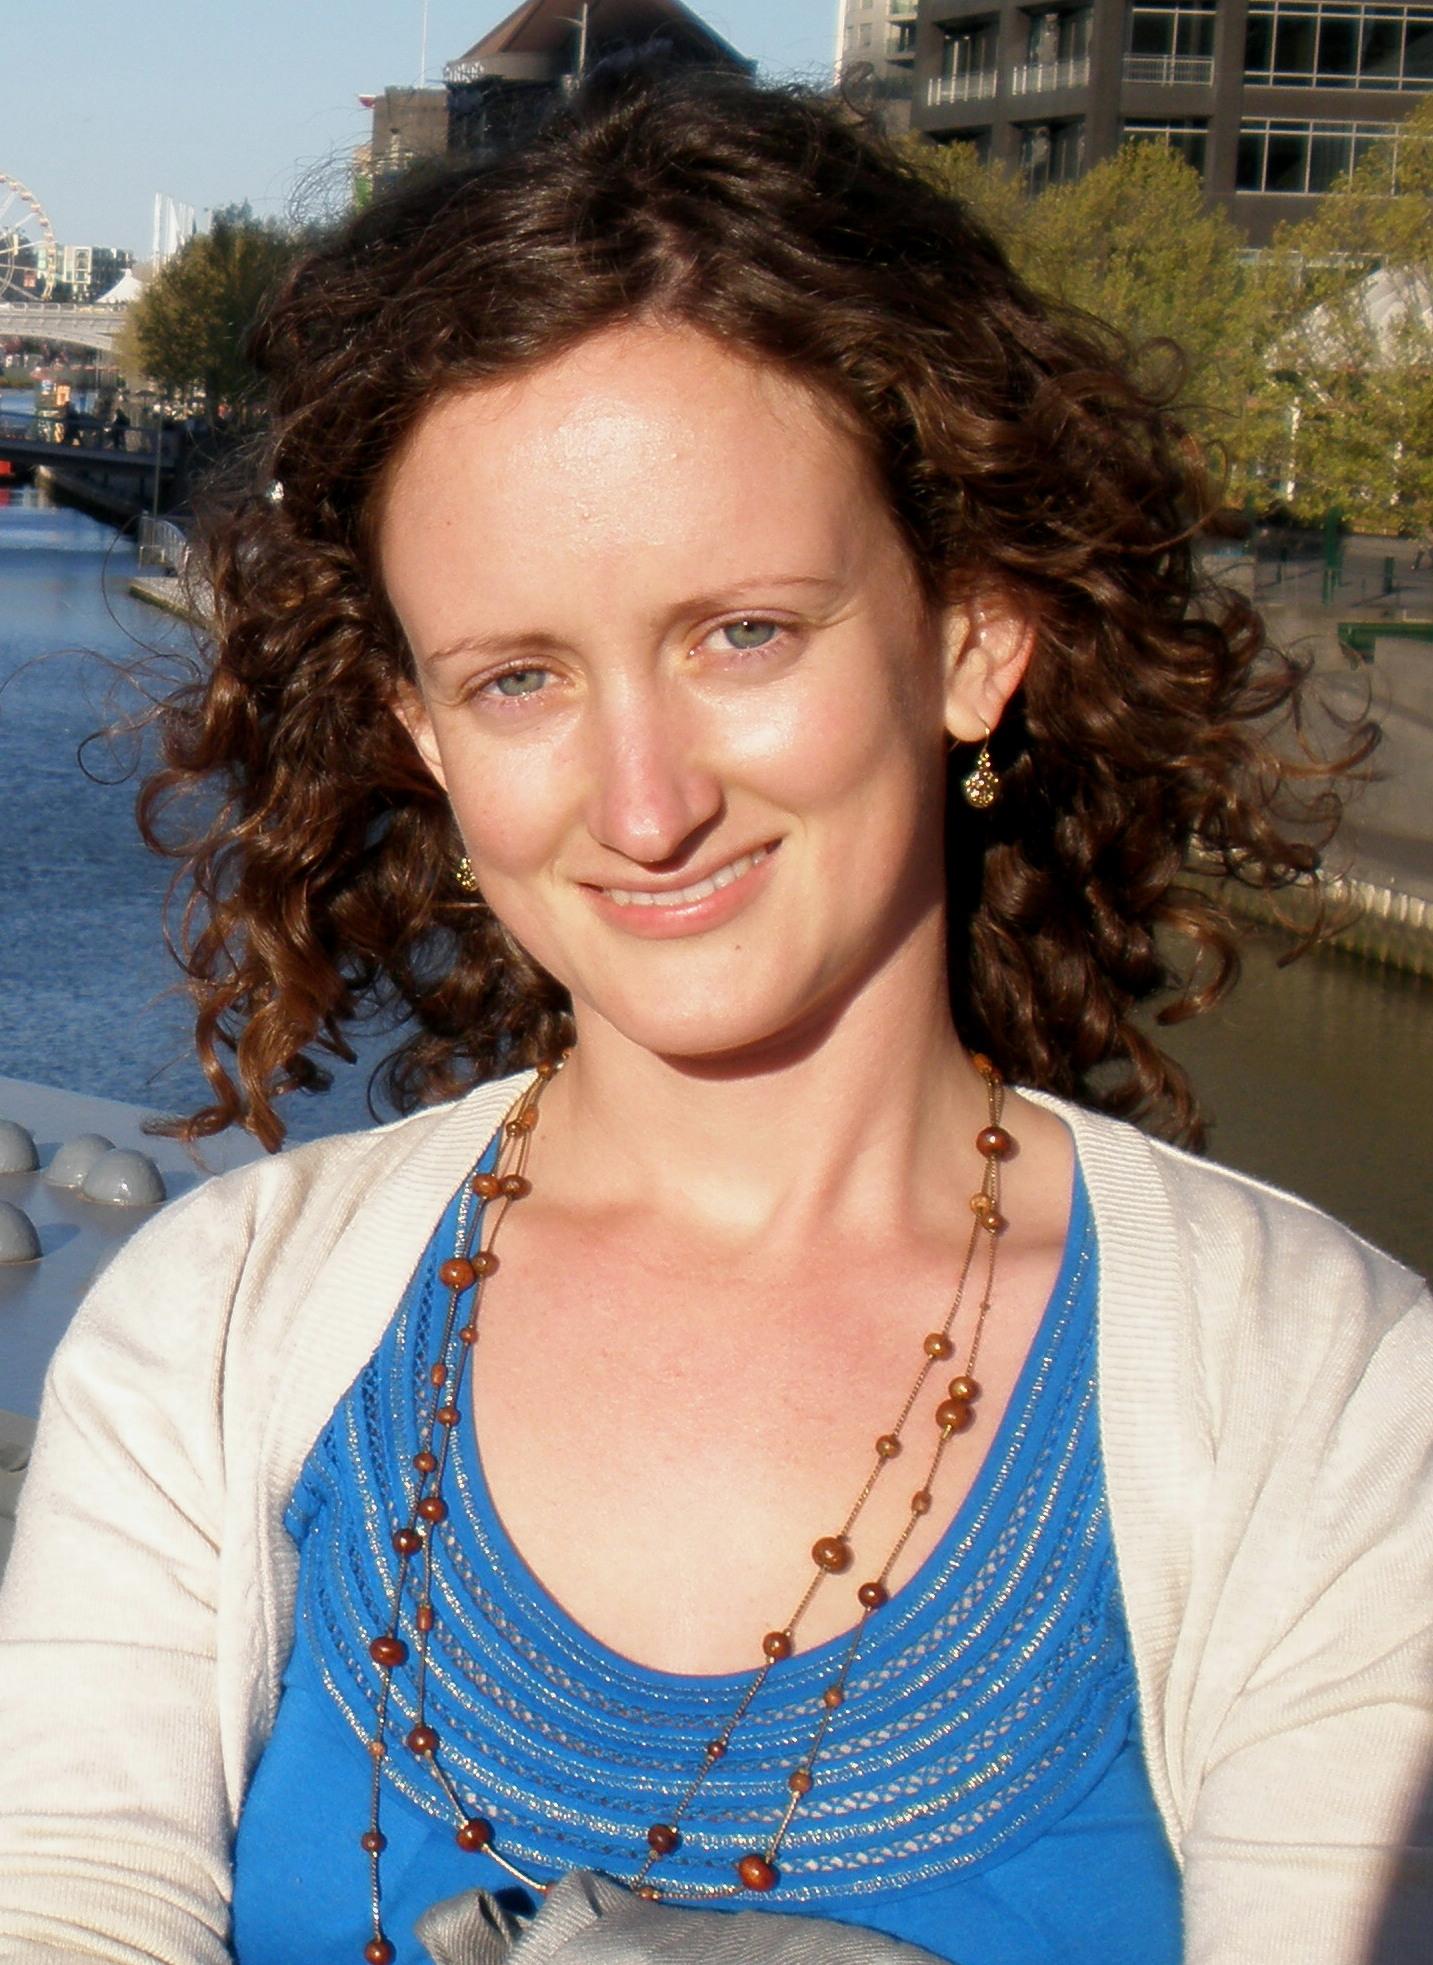 Gemma Hoyle has a PhD in Australian seed conservation biology.